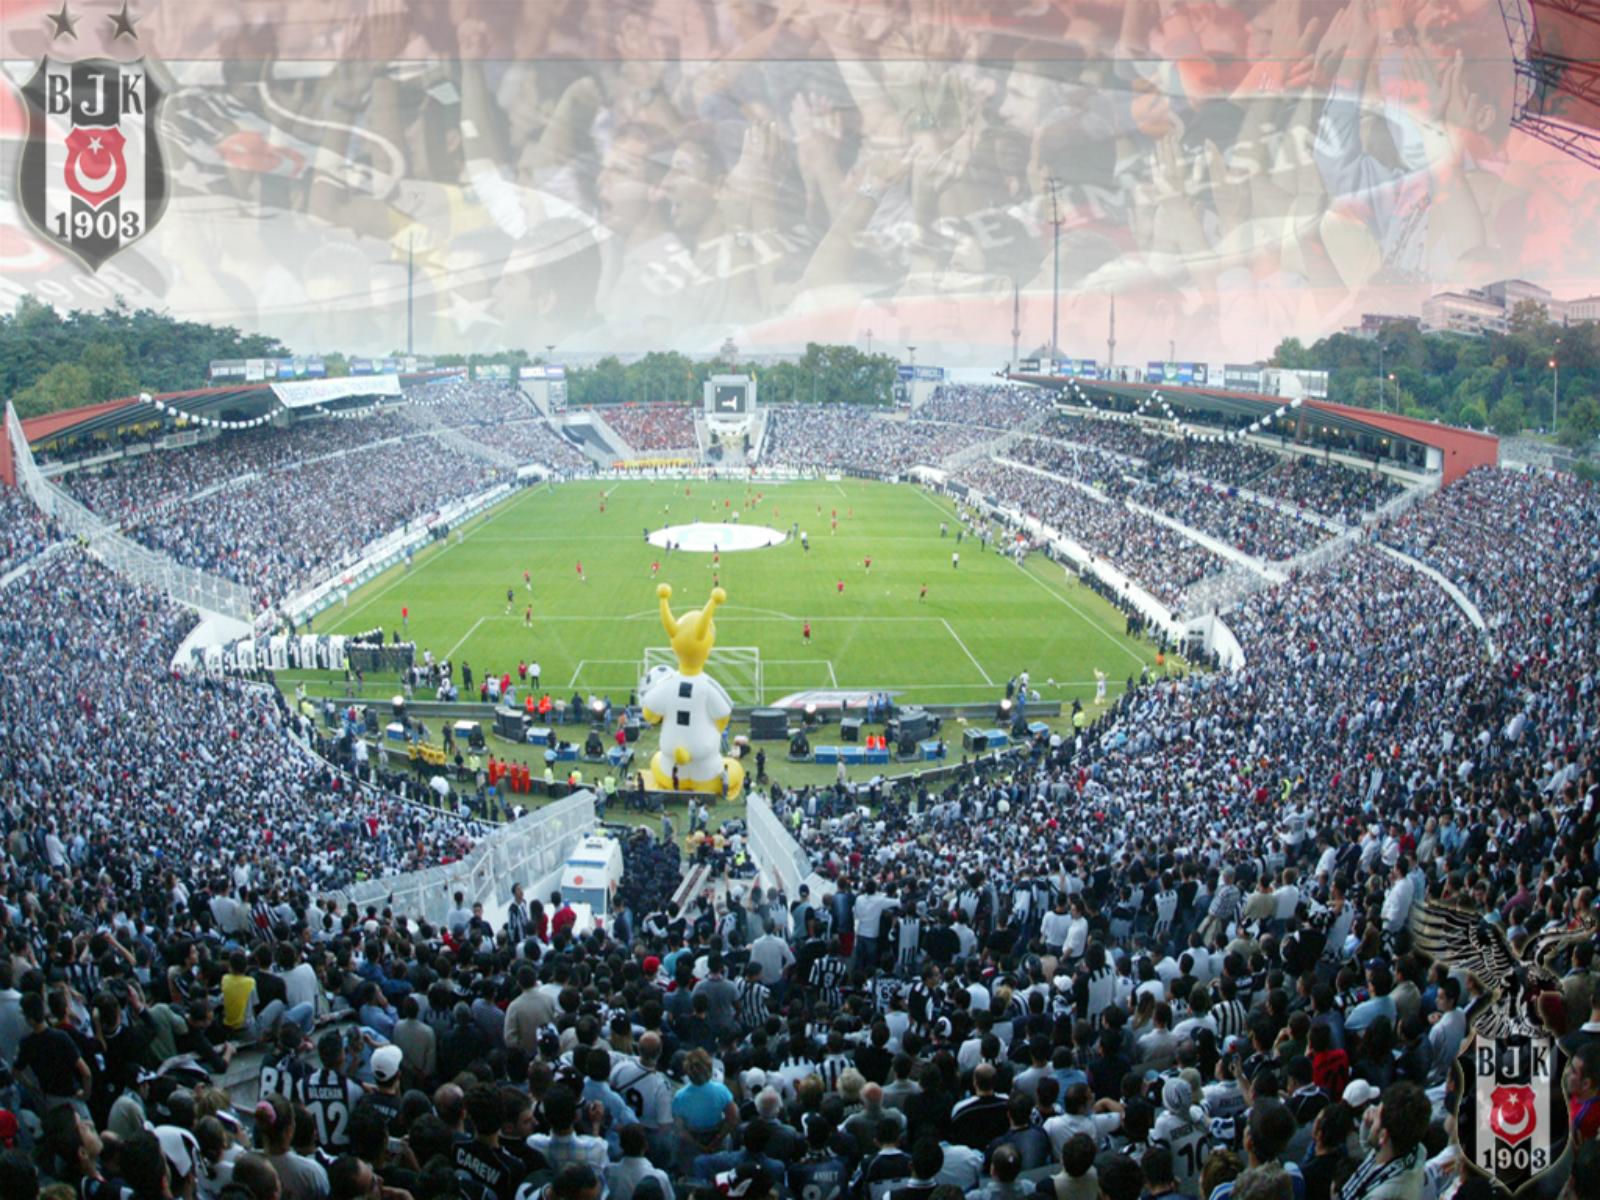 www.Vvallpaper.Net hd ismet in%25C3%25B6n%25C3%25BC stad%25C4%25B1 arka plan duvar ka%25C4%259F%25C4%25B1d%25C4%25B1 kara kartal siyah beyaz Masa %25C3%25BCst%25C3%25BC indir 2012 Beşiktaş HD Logoları